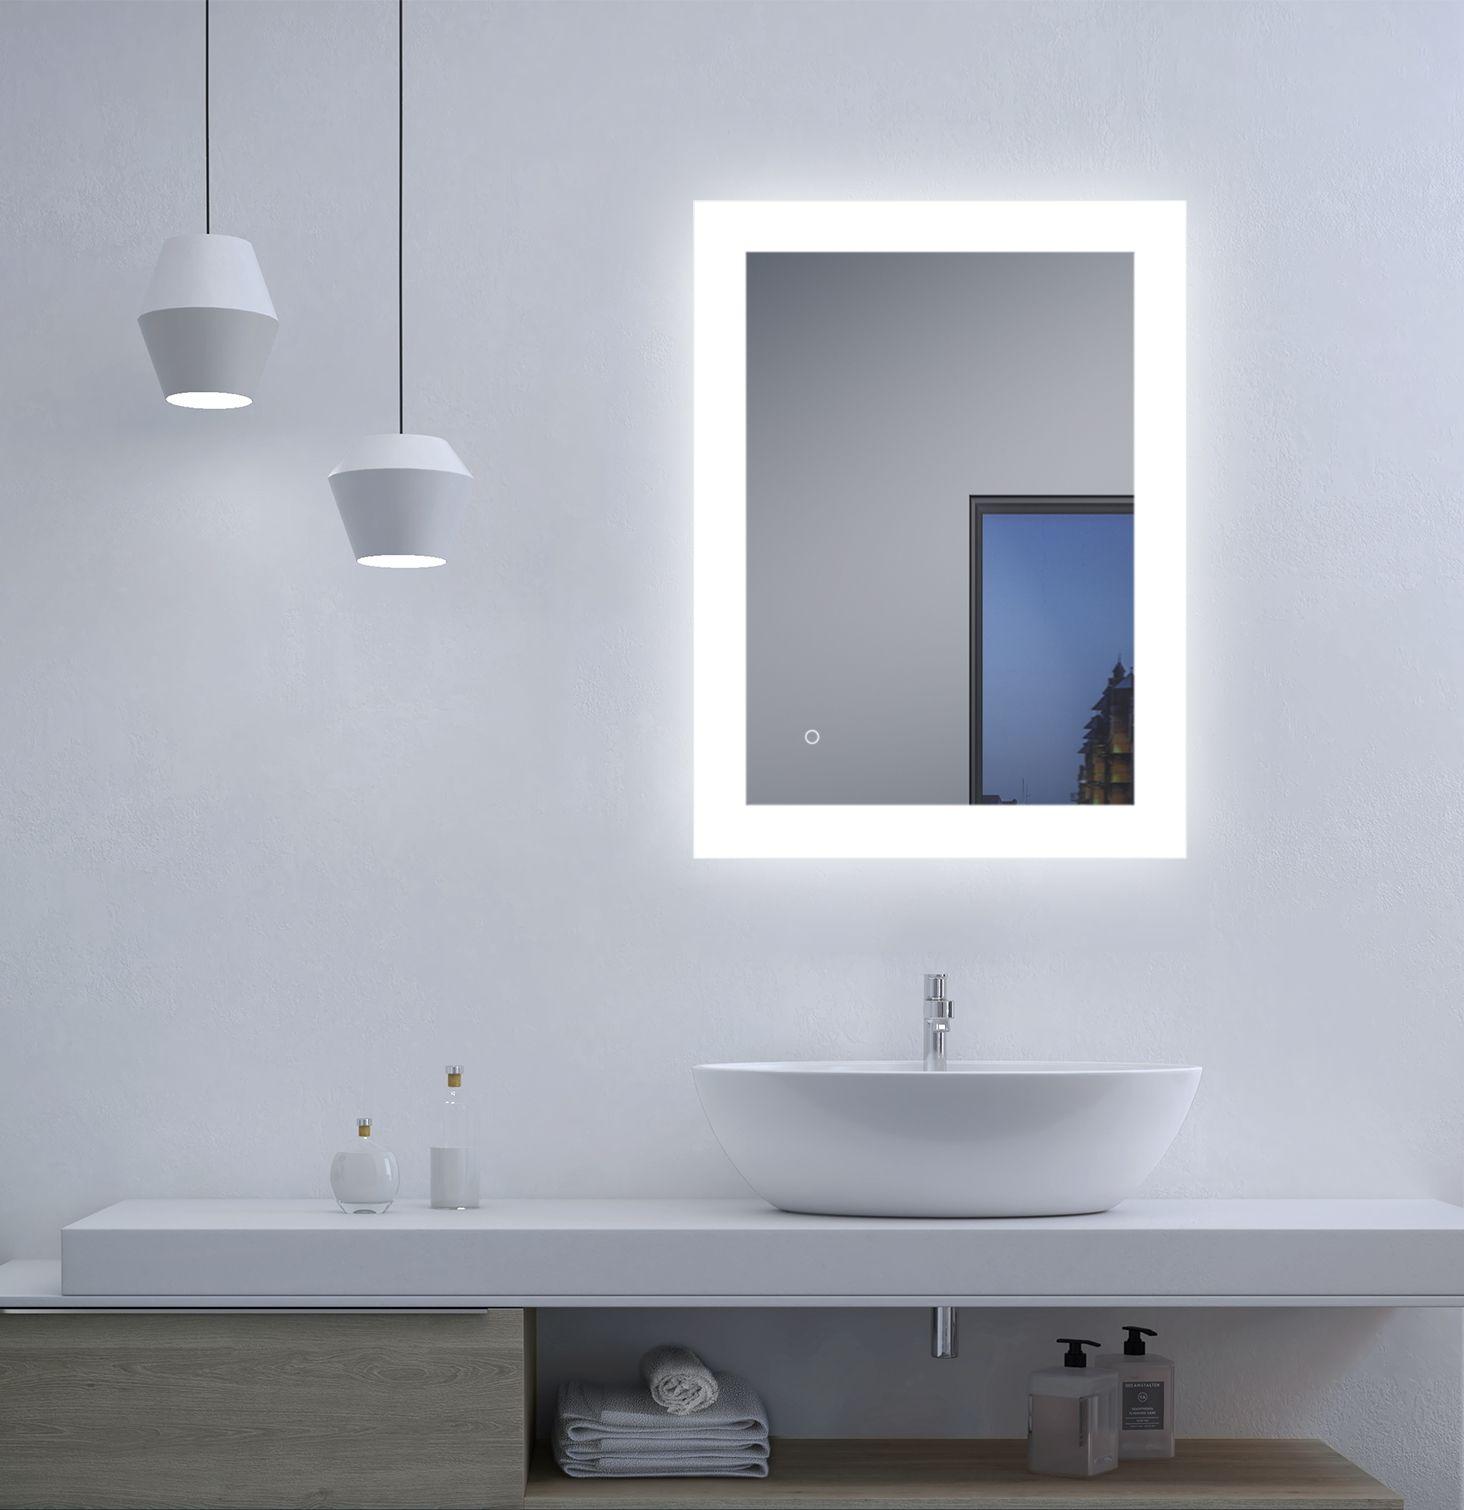 Talos Bright Badezimmerspiegel Spritzwassergeschutzt In 2020 Badezimmerspiegel Led Spiegel Led